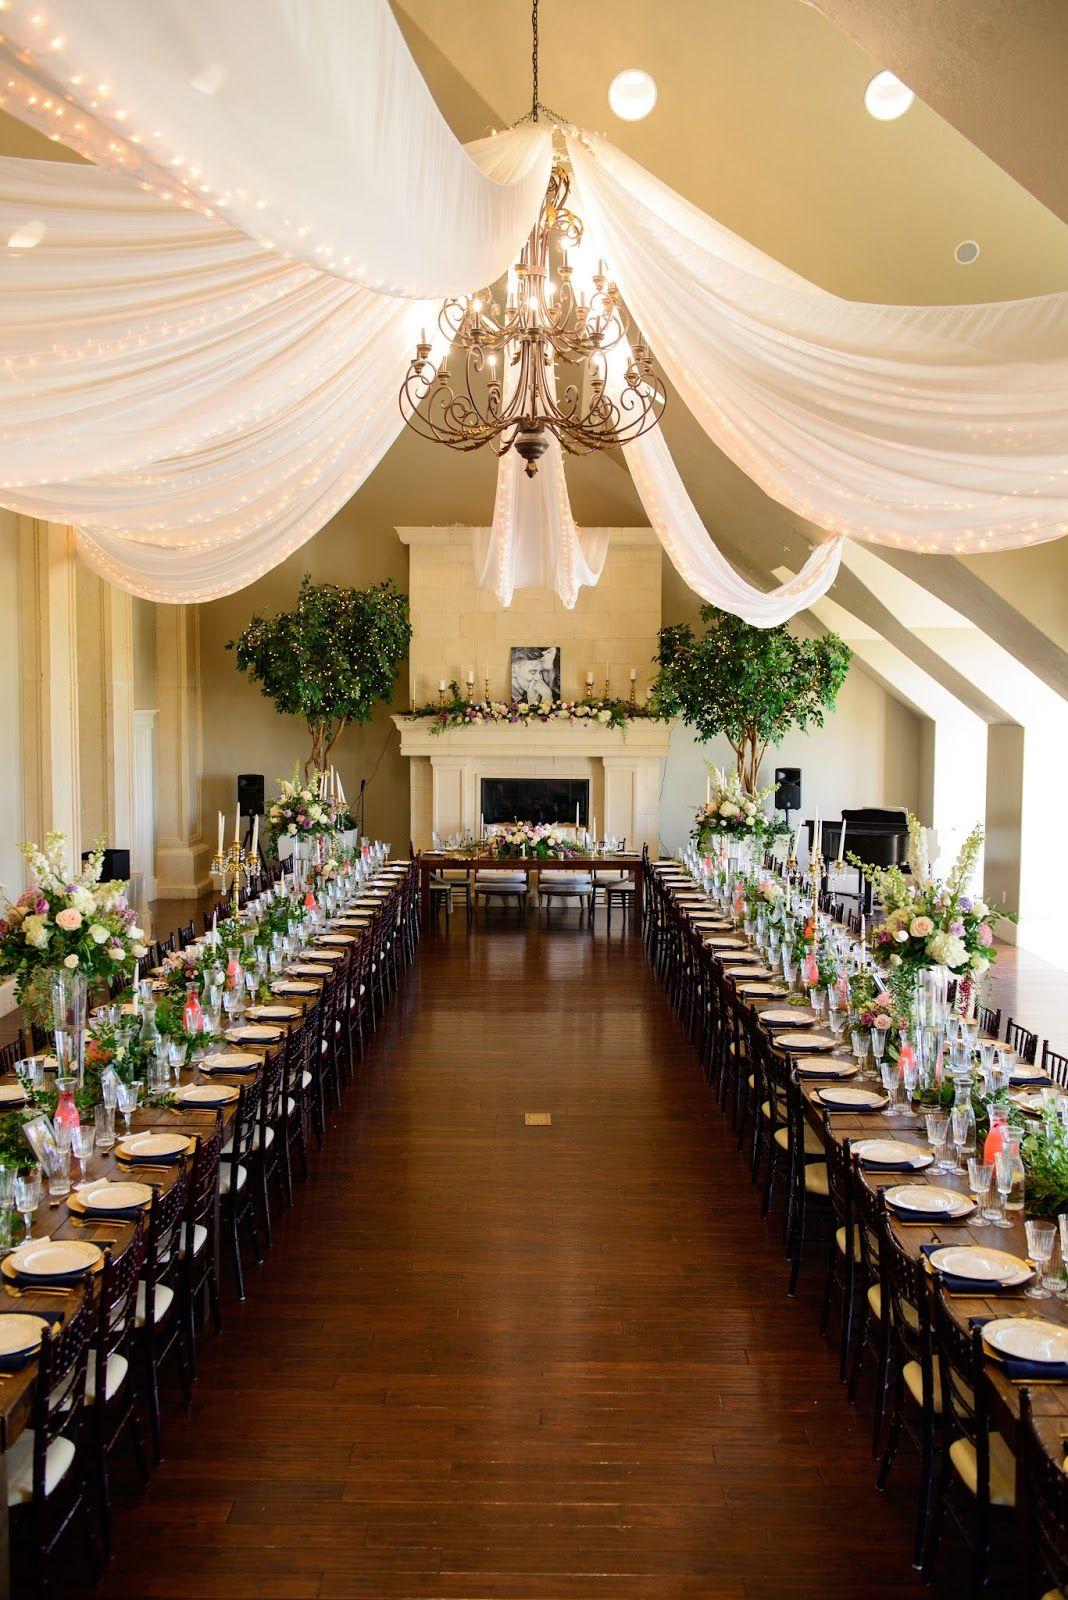 Farmhouse Tables - Alpine Event Rentals  Sunset Room ...